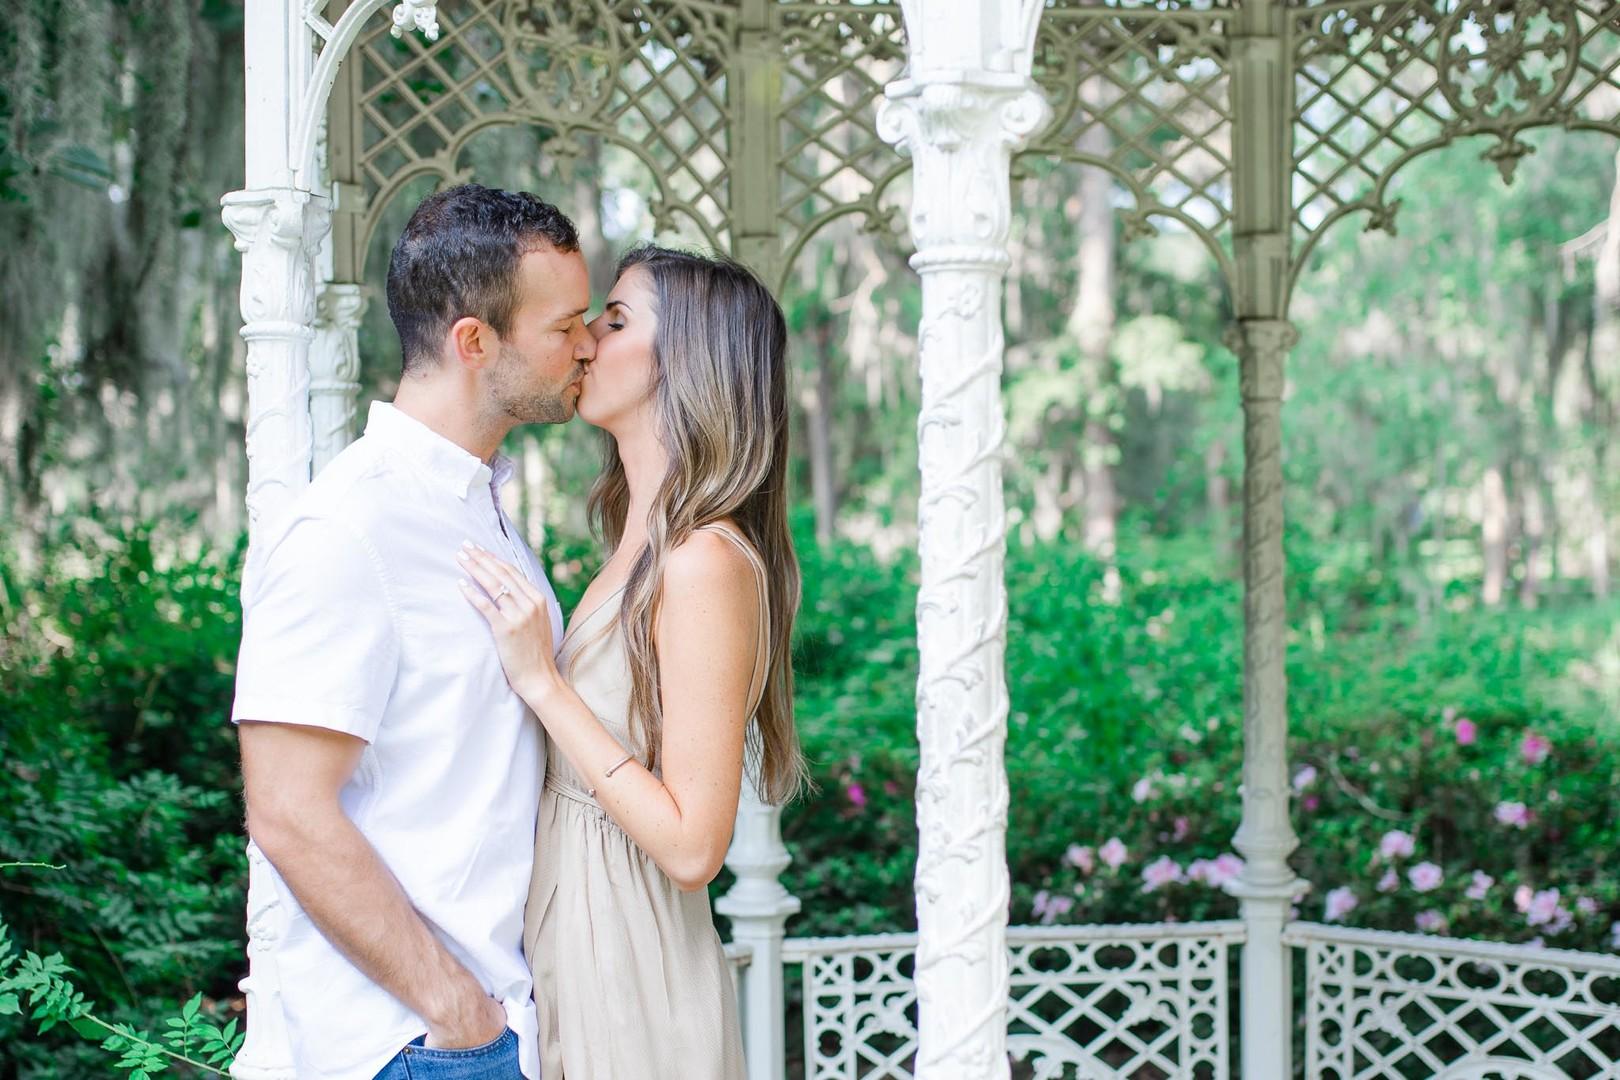 Lauren + Zac: Captivating Garden Engagement Session at Magnolia Plantation | Palmetto State Weddings